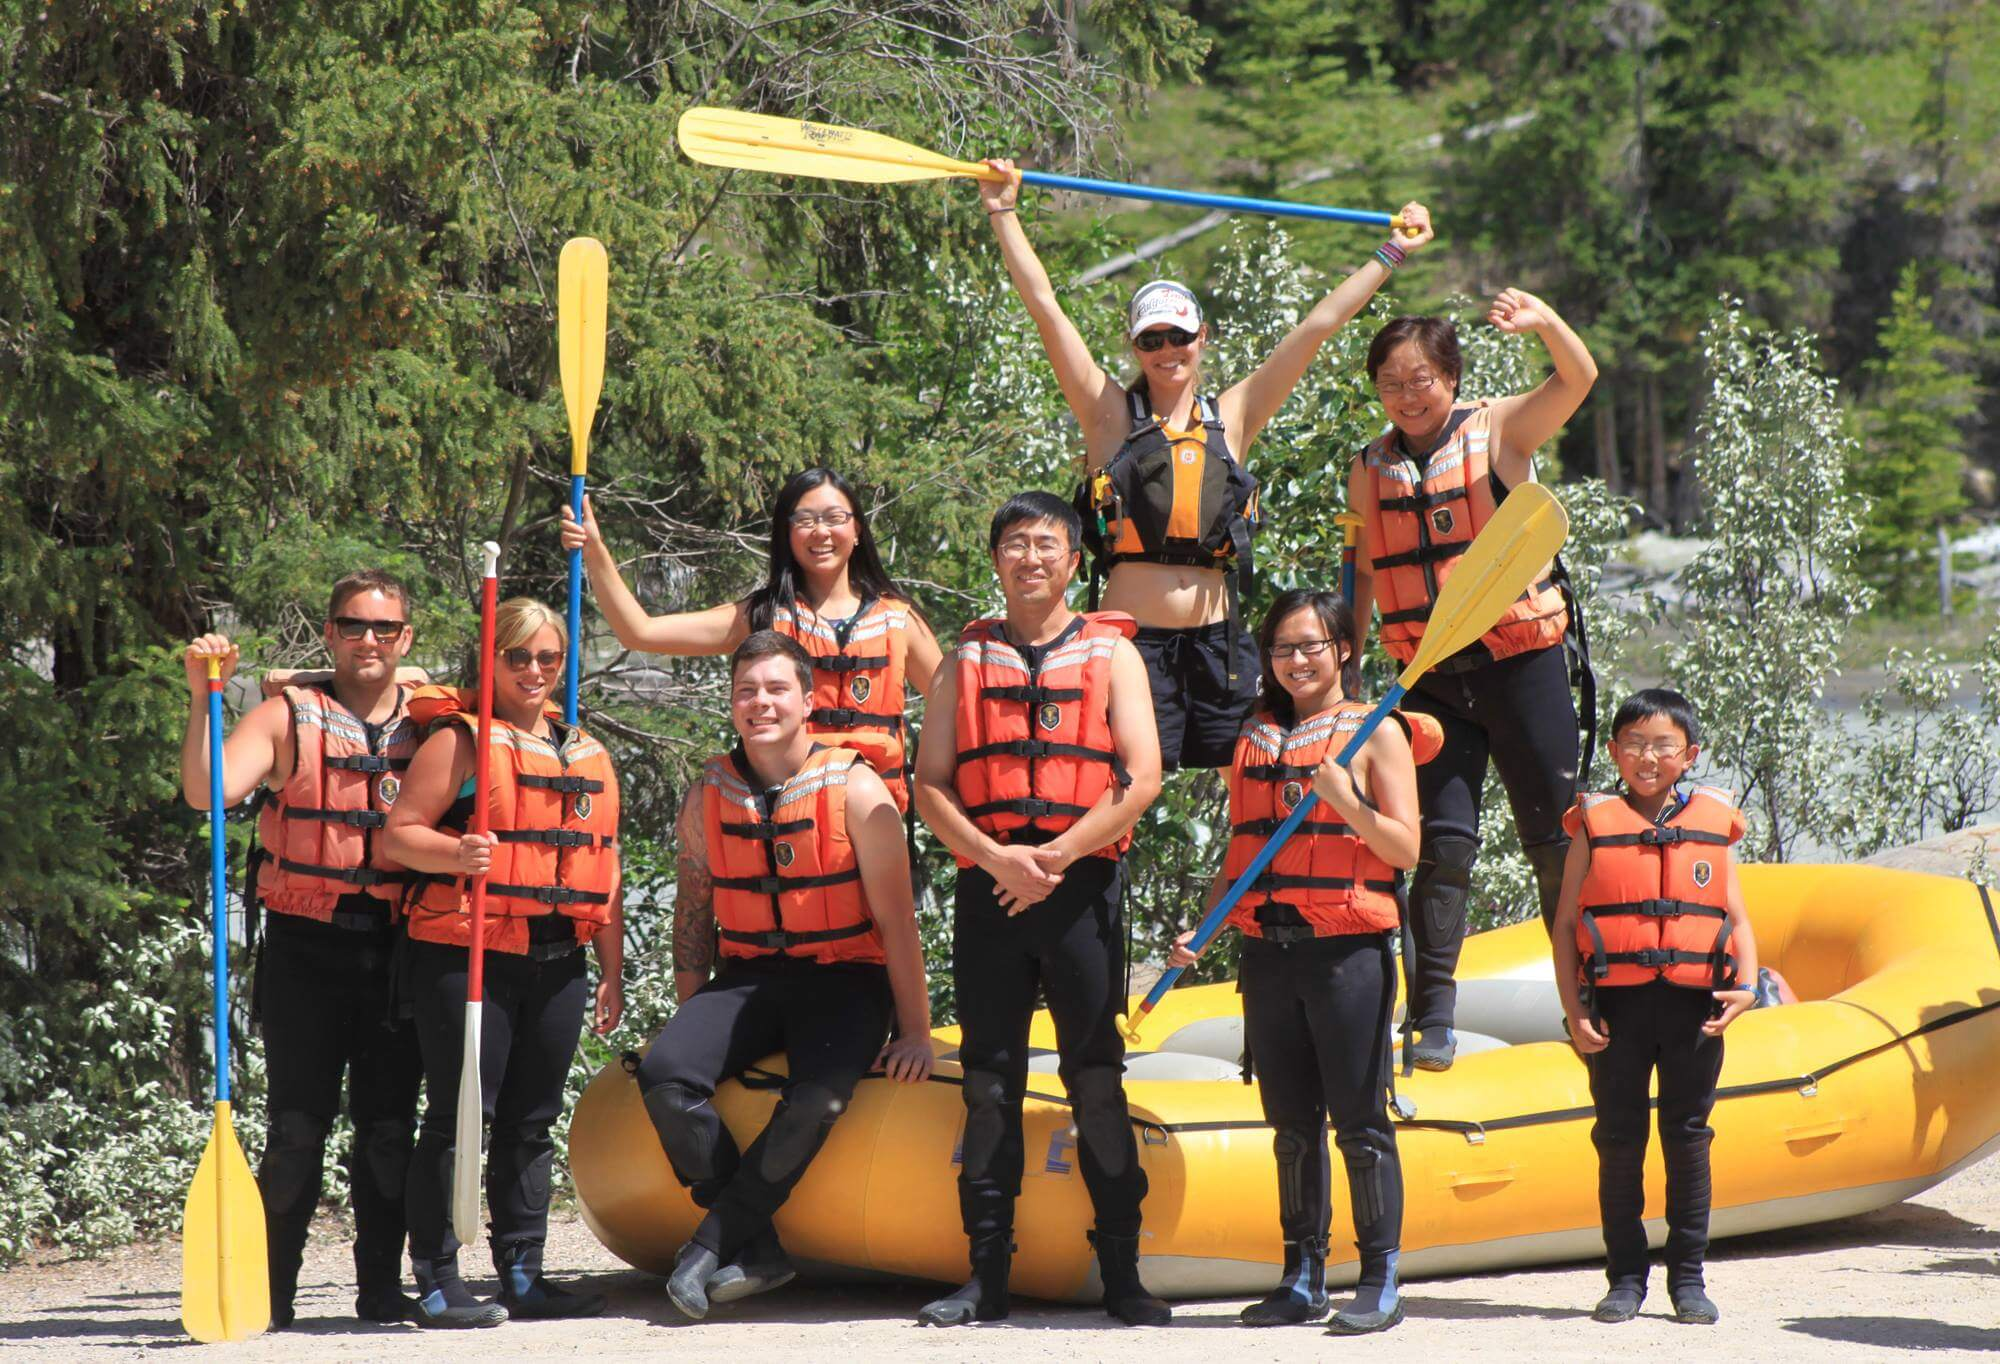 White Water Rafting Jasper Canada Adventure Explore Alberta